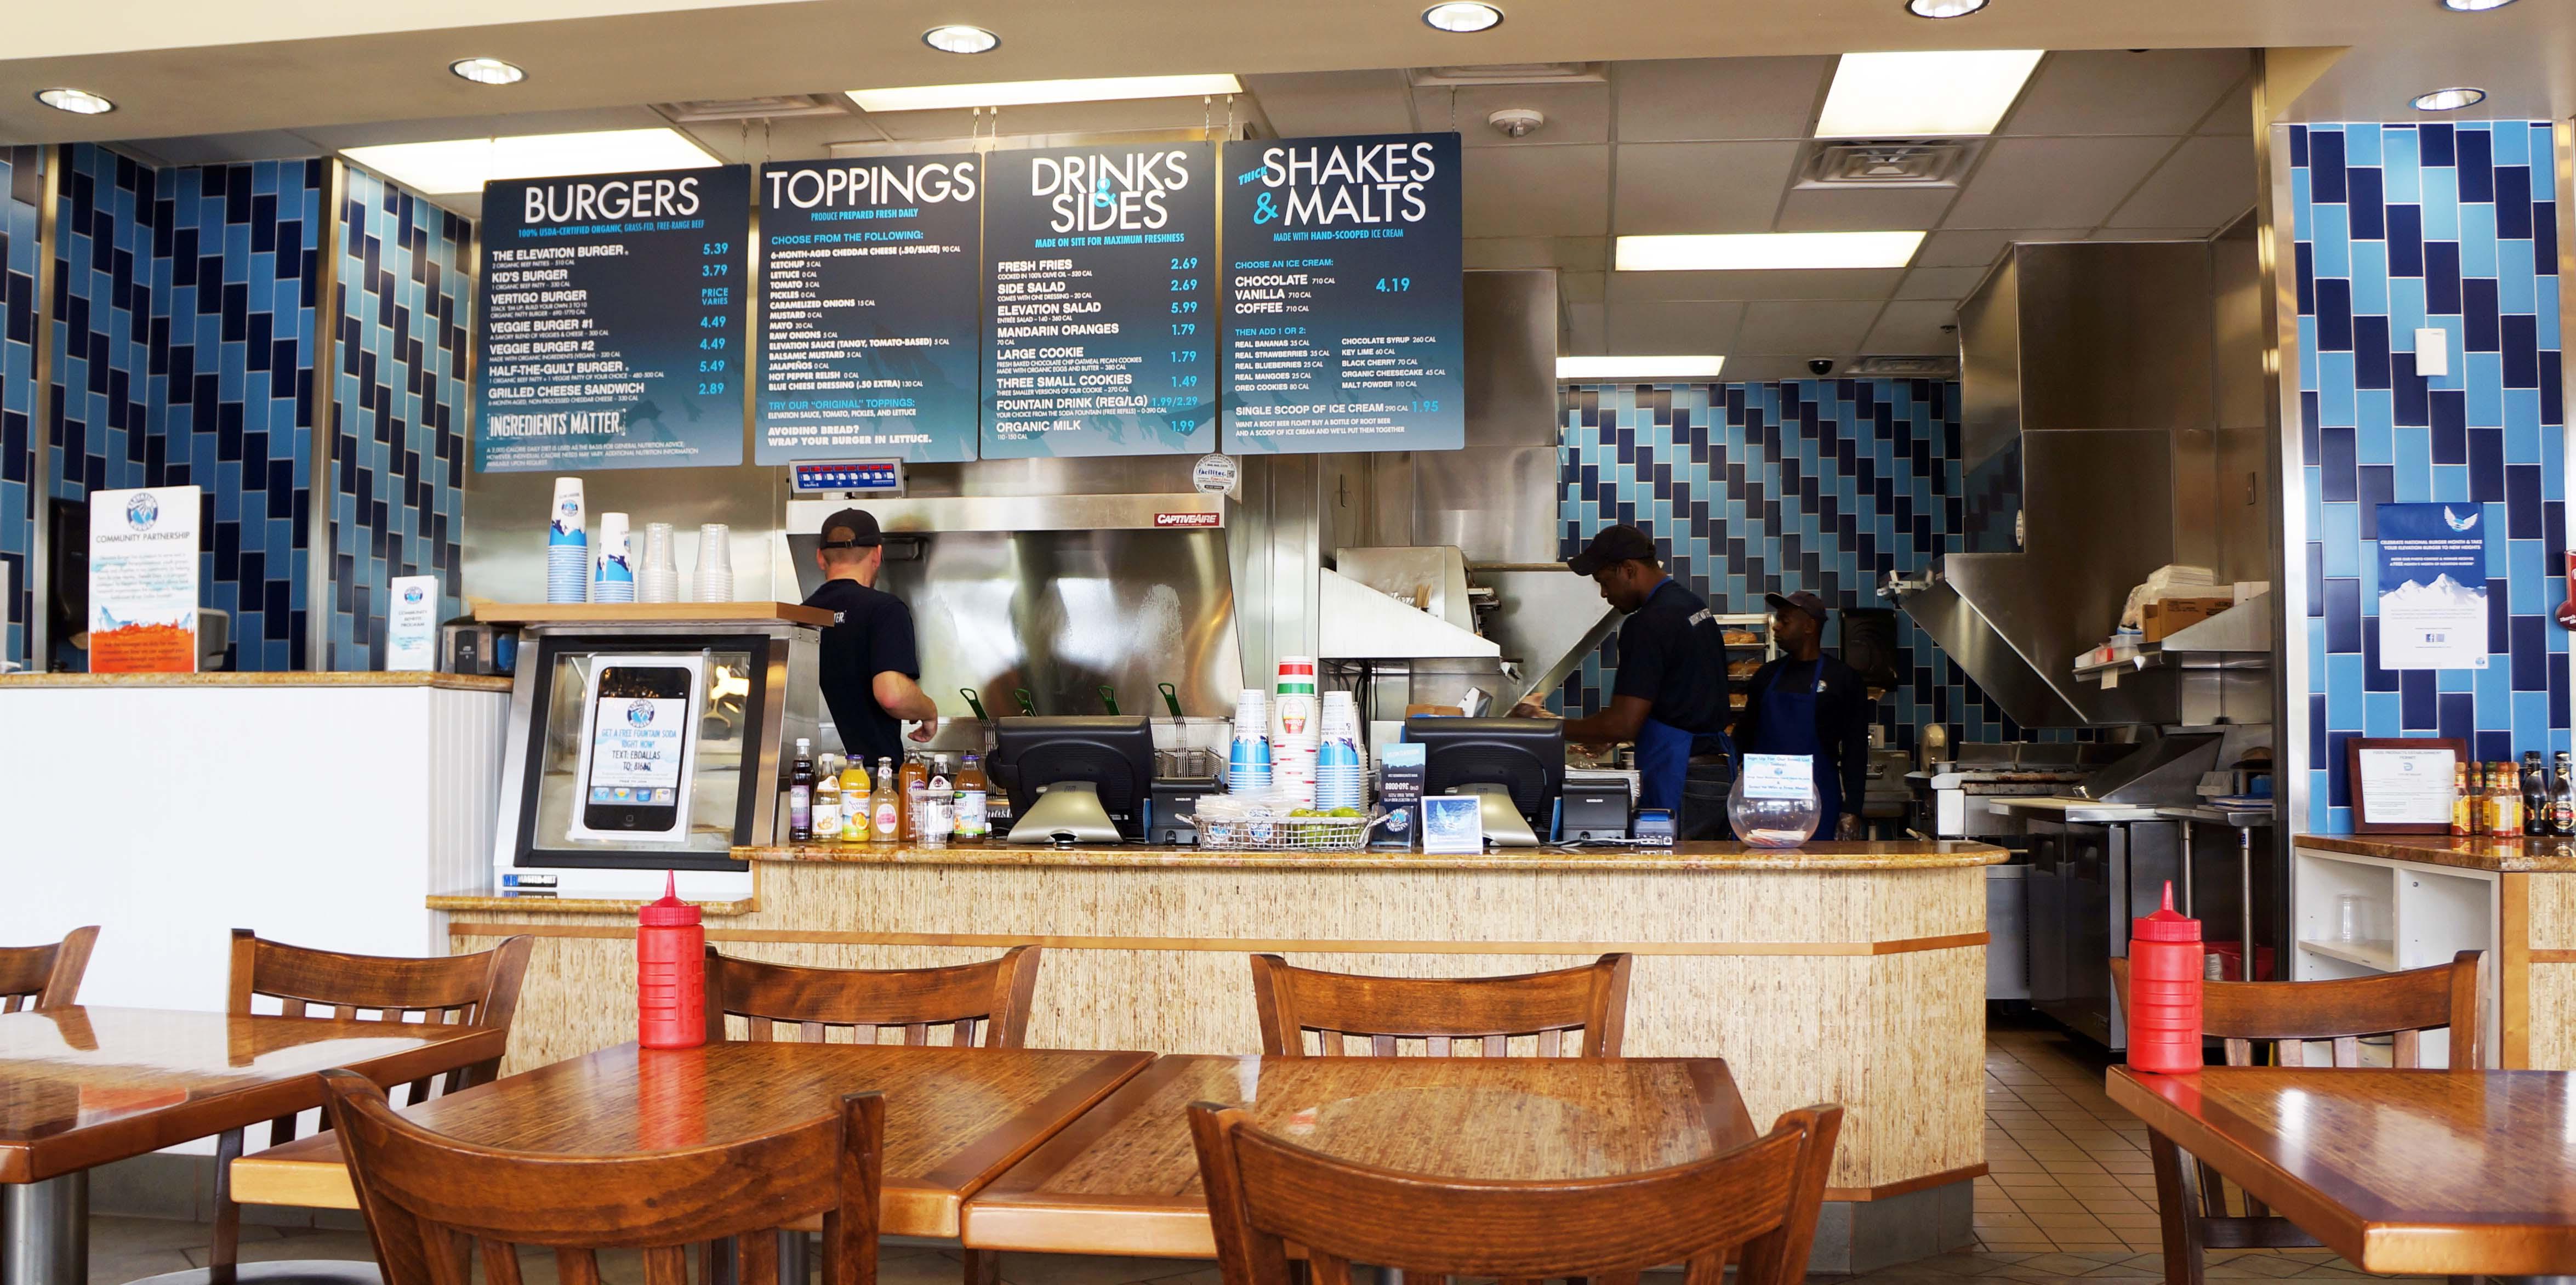 Elevation Burger Is A Healthier Burger Option Cravedfw - Elevation locations